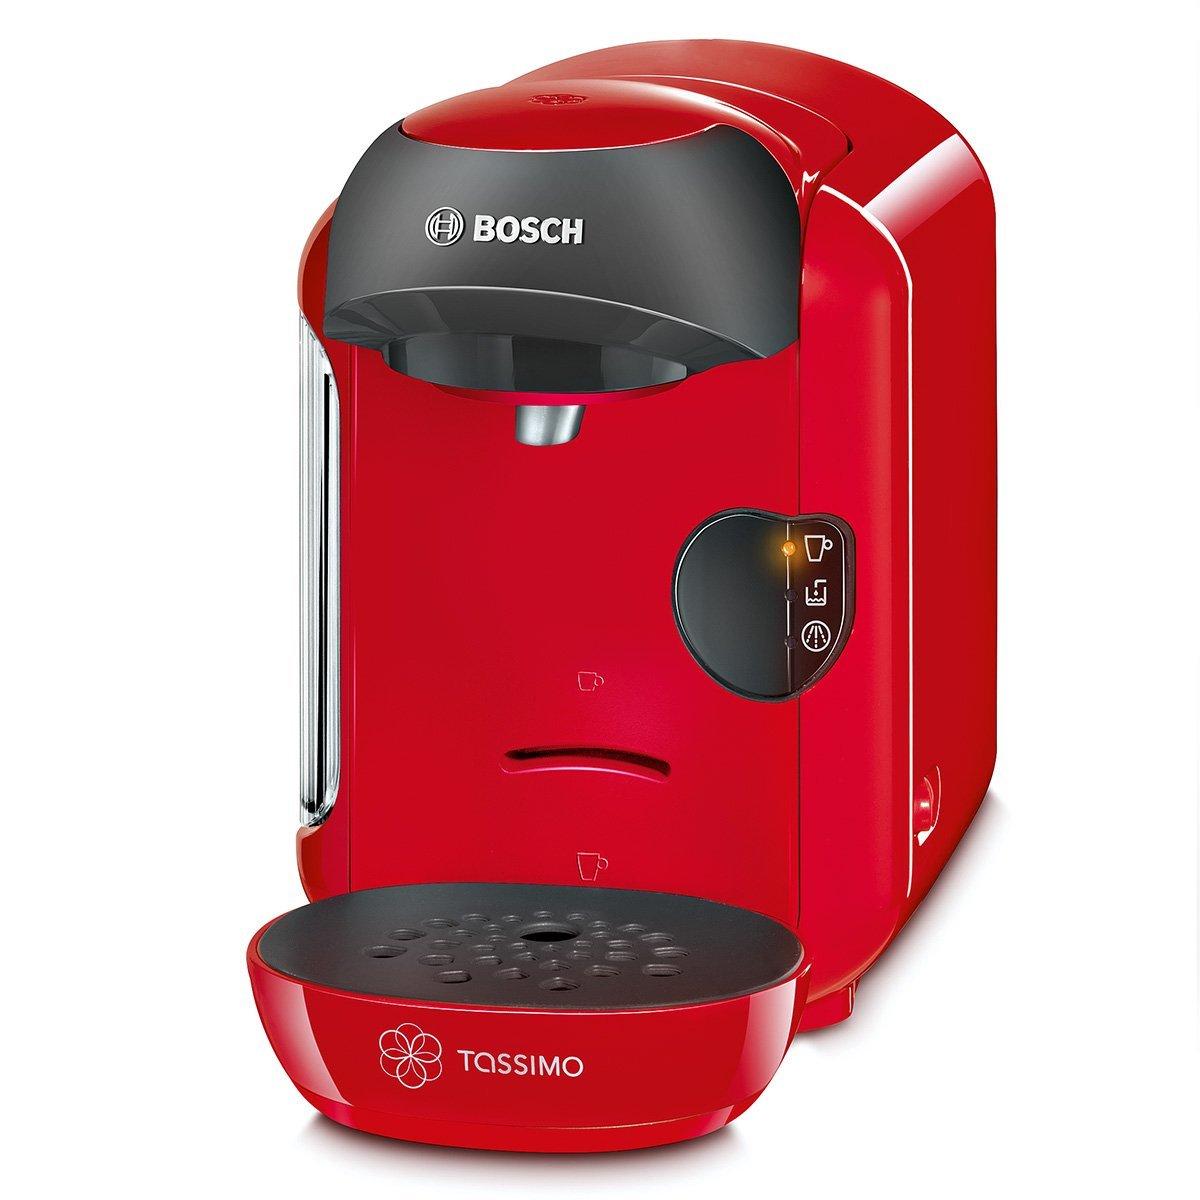 Bosch-TAS1253-Tassimo-Multi-Getränke-Automat-VIVY Tassimo VIVY